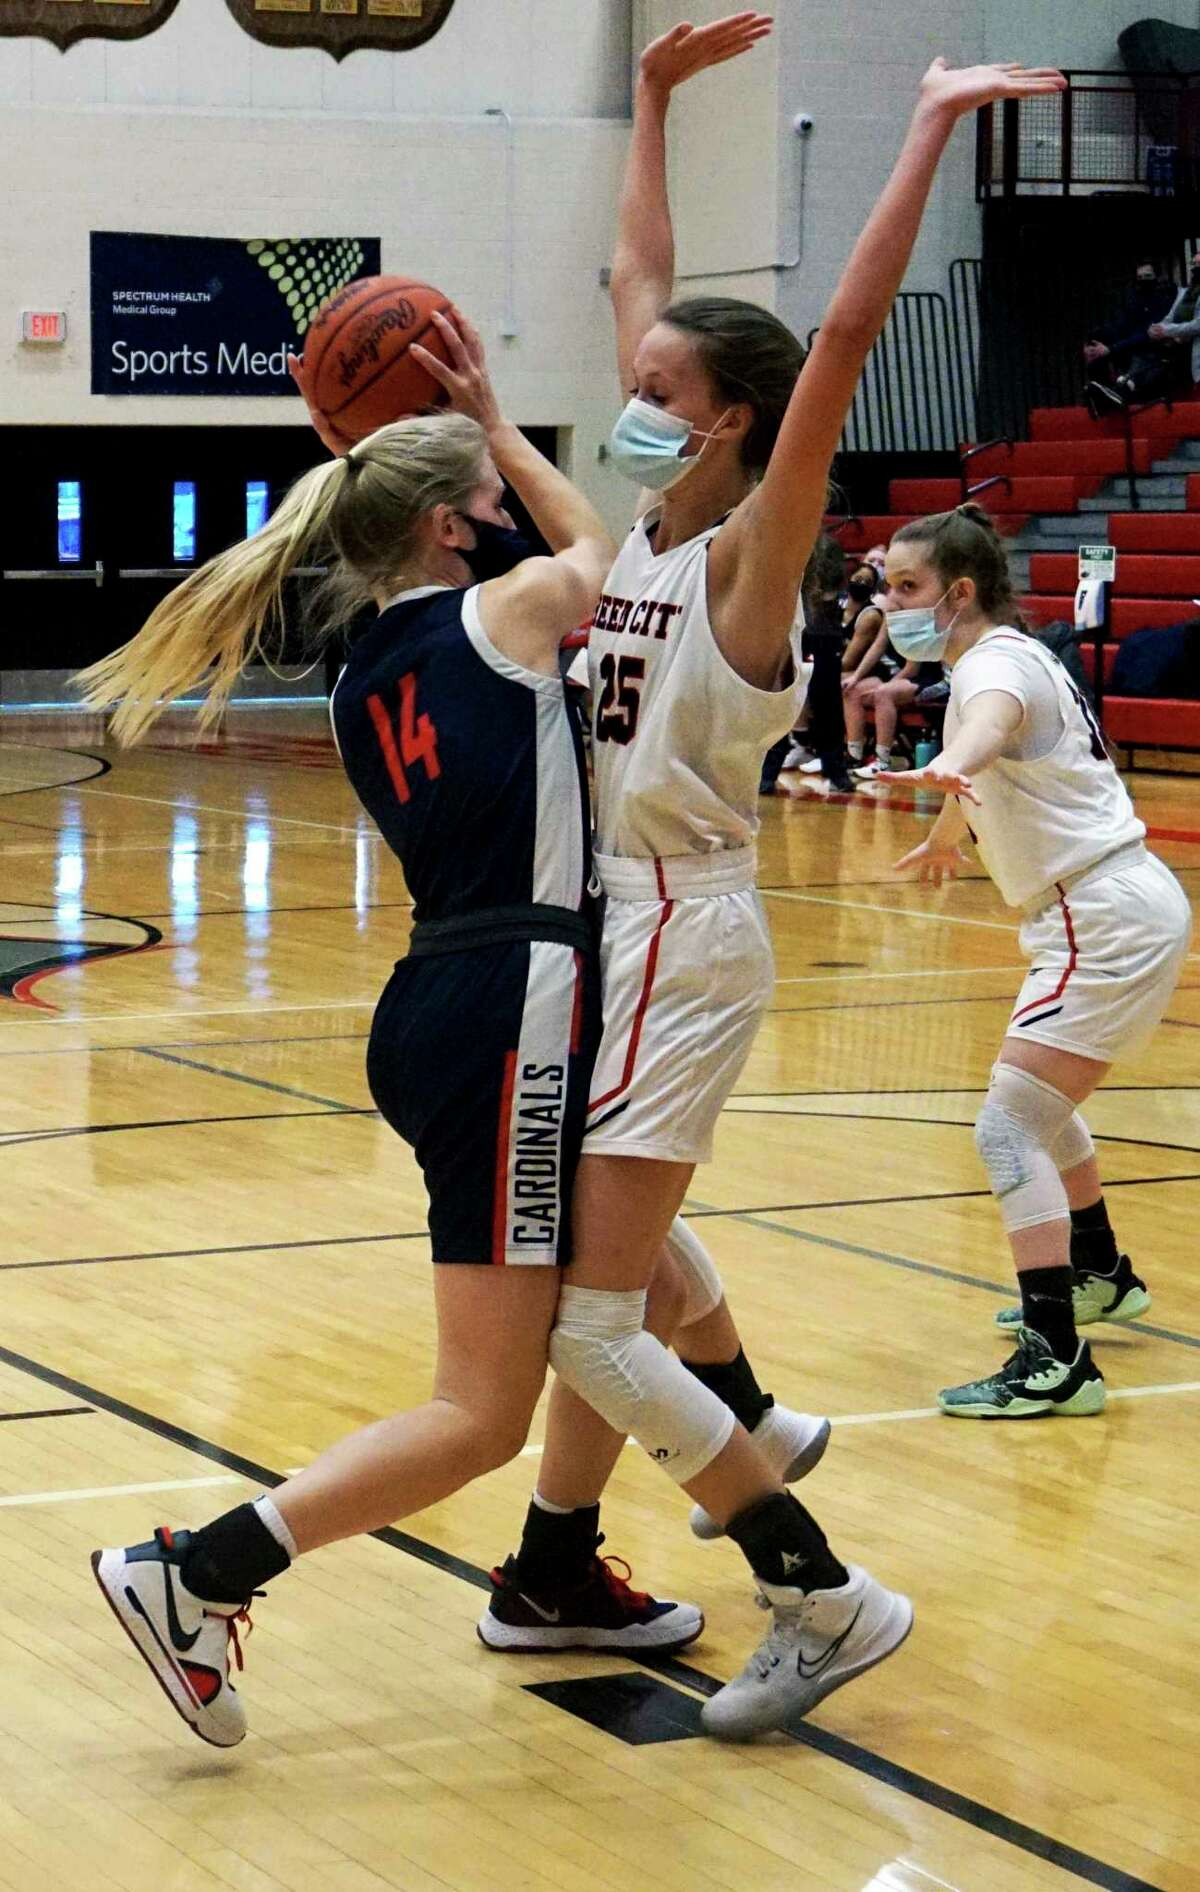 Junior Makenna Rautio, of Big Rapids, attacks the lane as Reed City freshman Kyleigh Weck guards her during Tuesday night's basketball game. (Pioneer photo/Joe Judd)